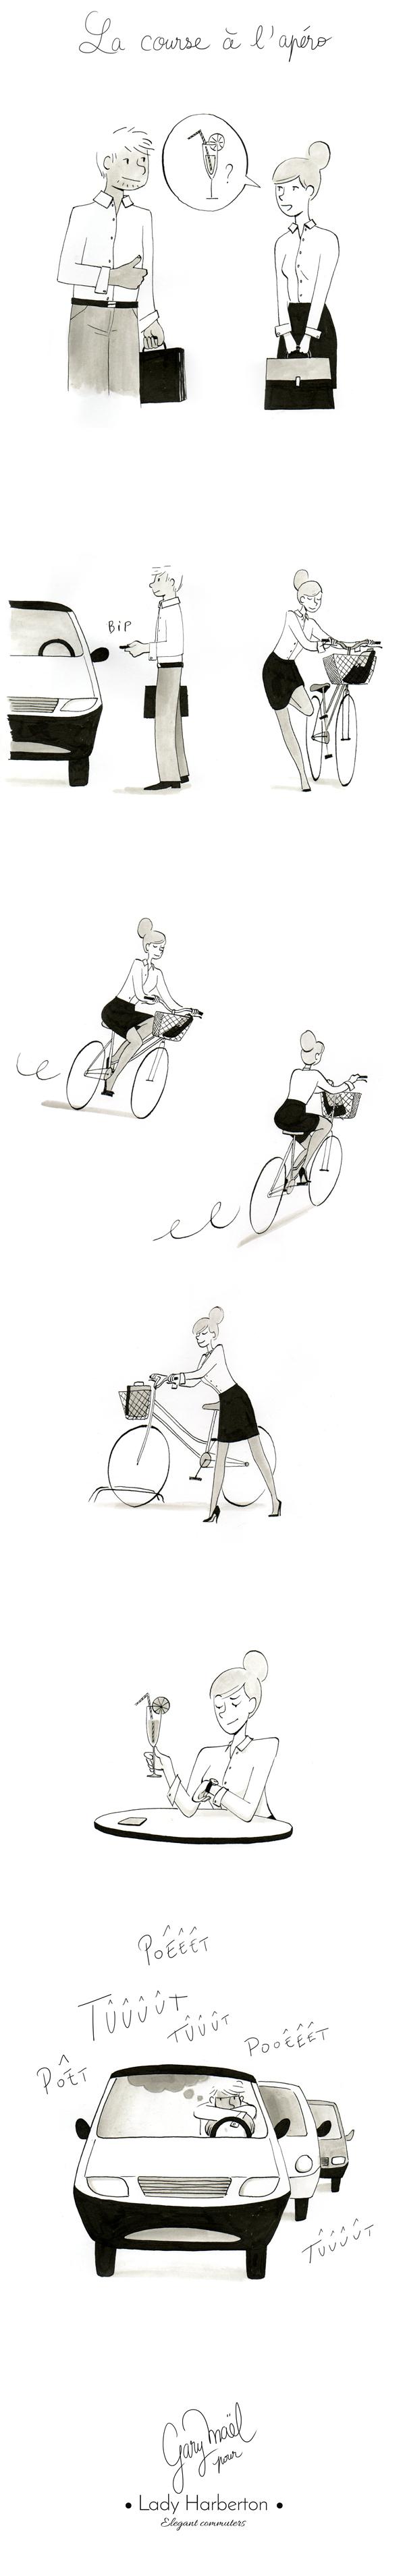 femme velo sportive apéro storicyclettes Gary Maël Lady Harberton